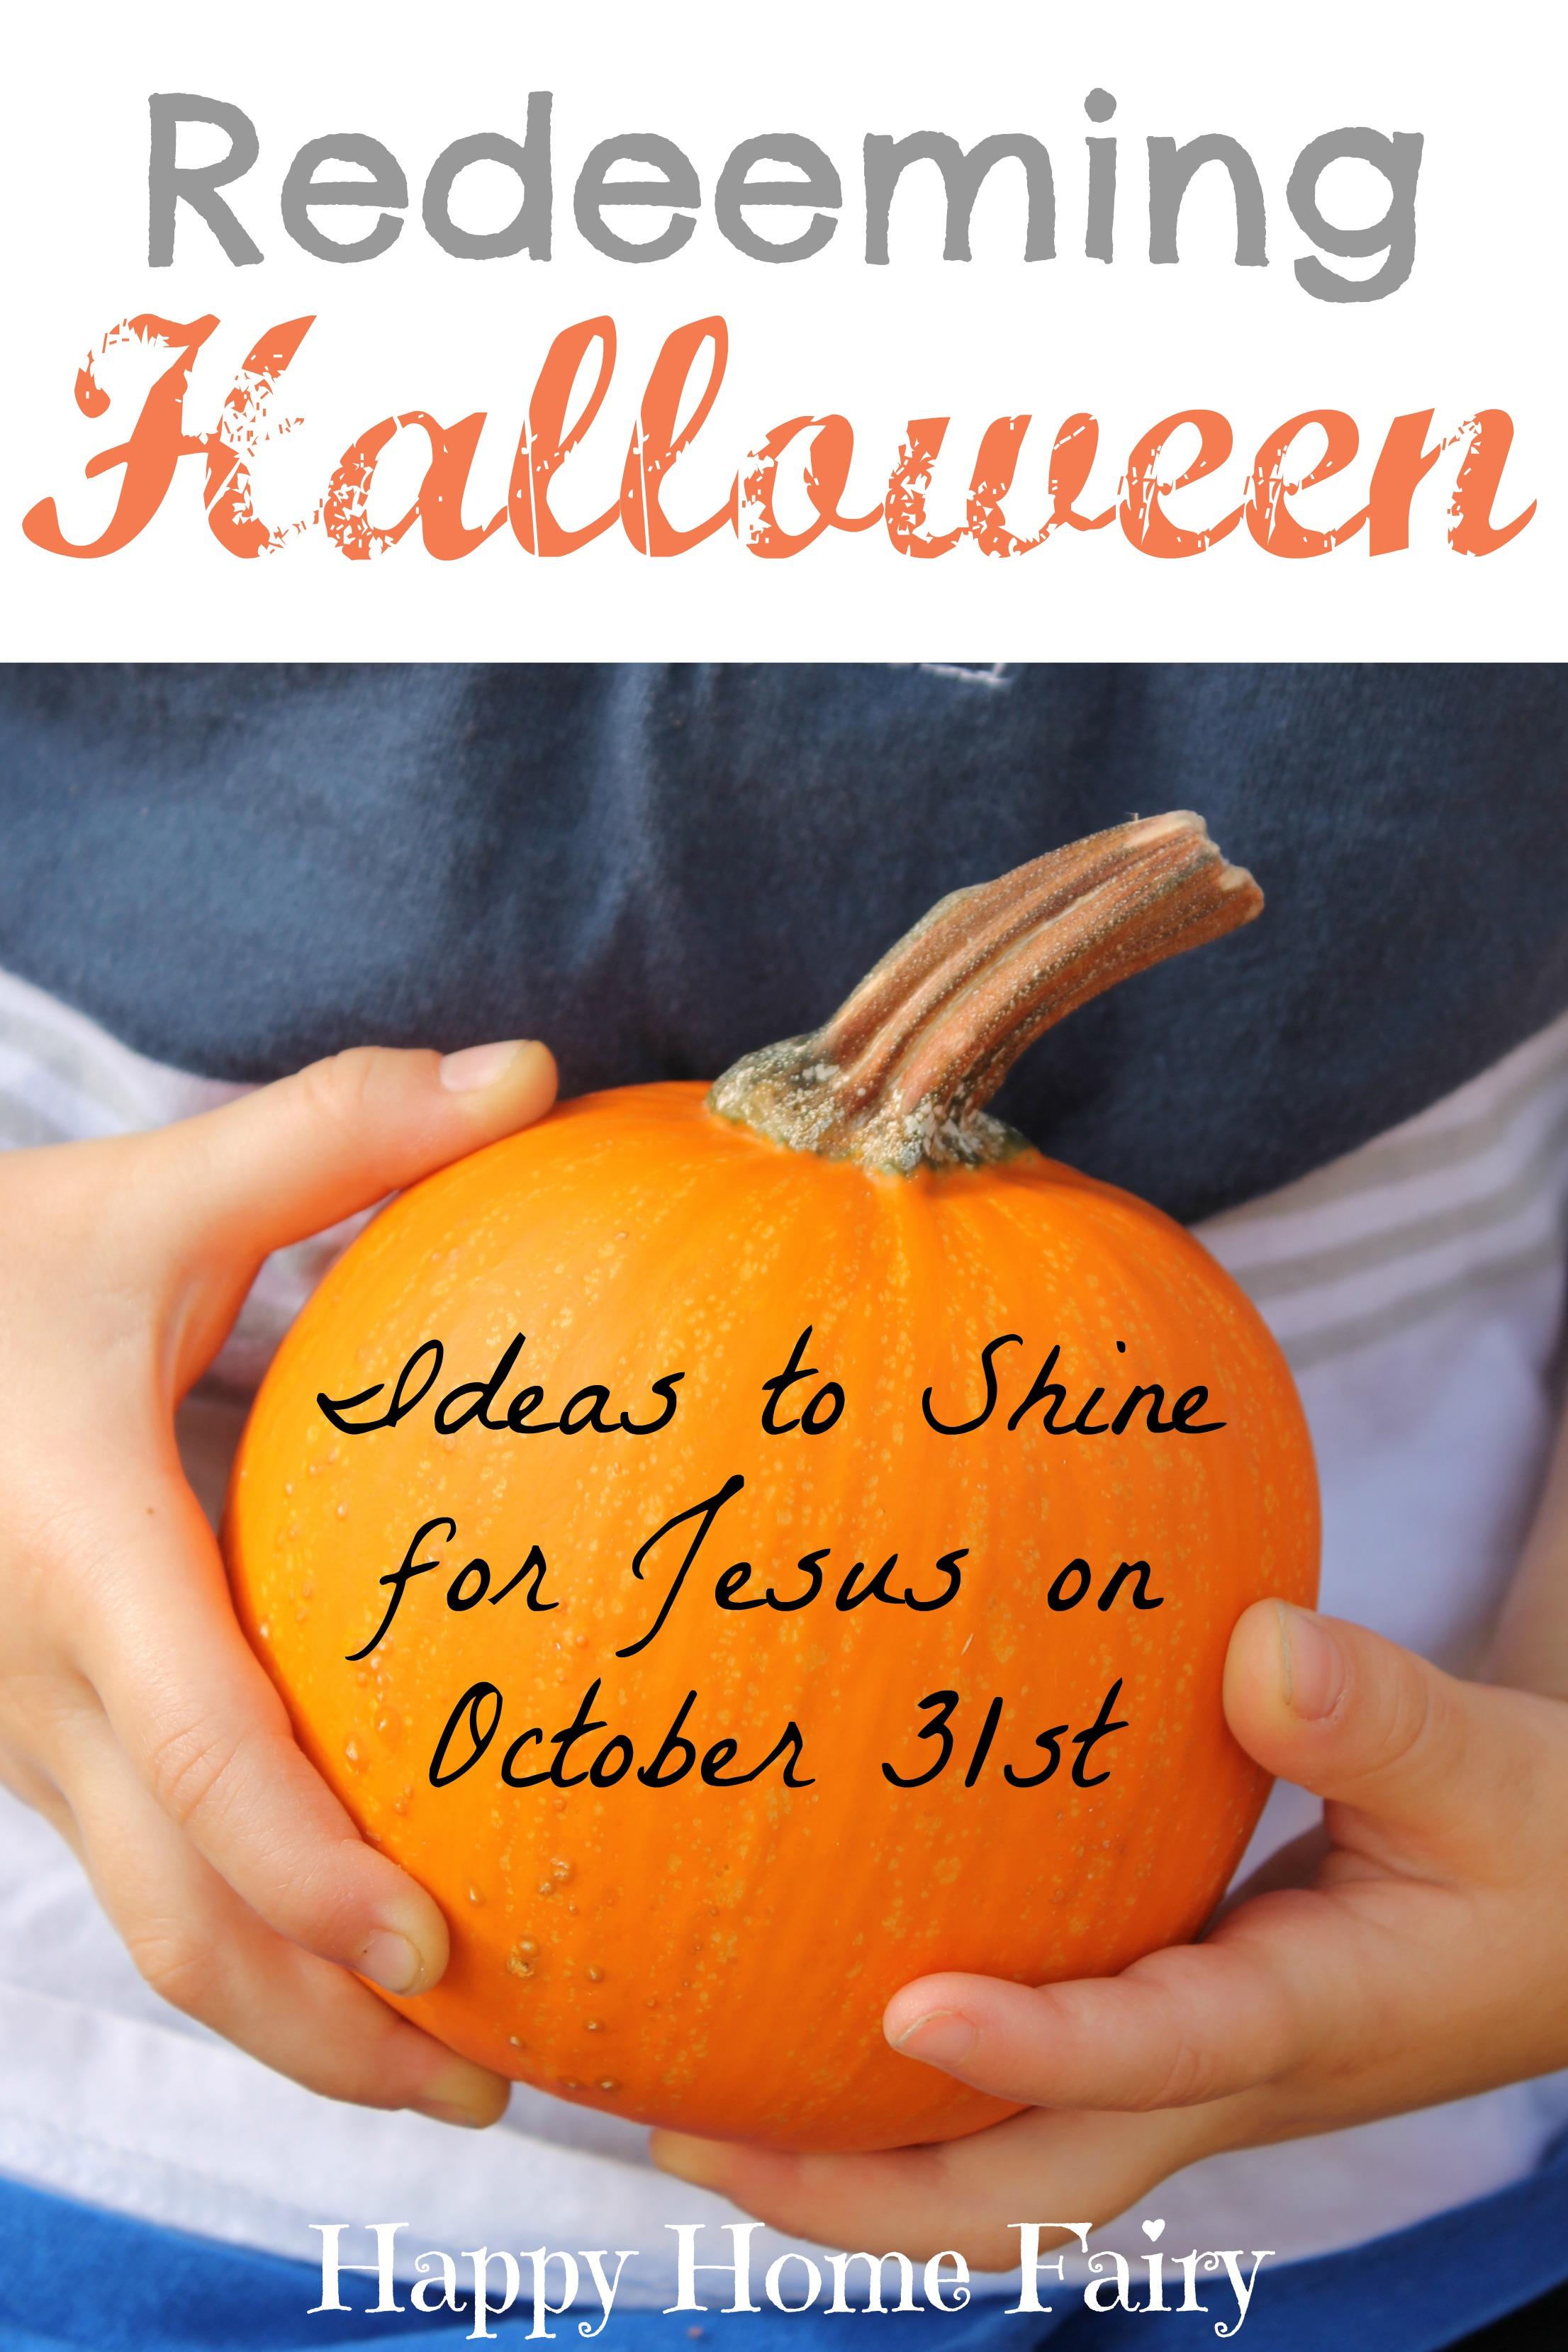 Christian Halloween Archives - Happy Home Fairy